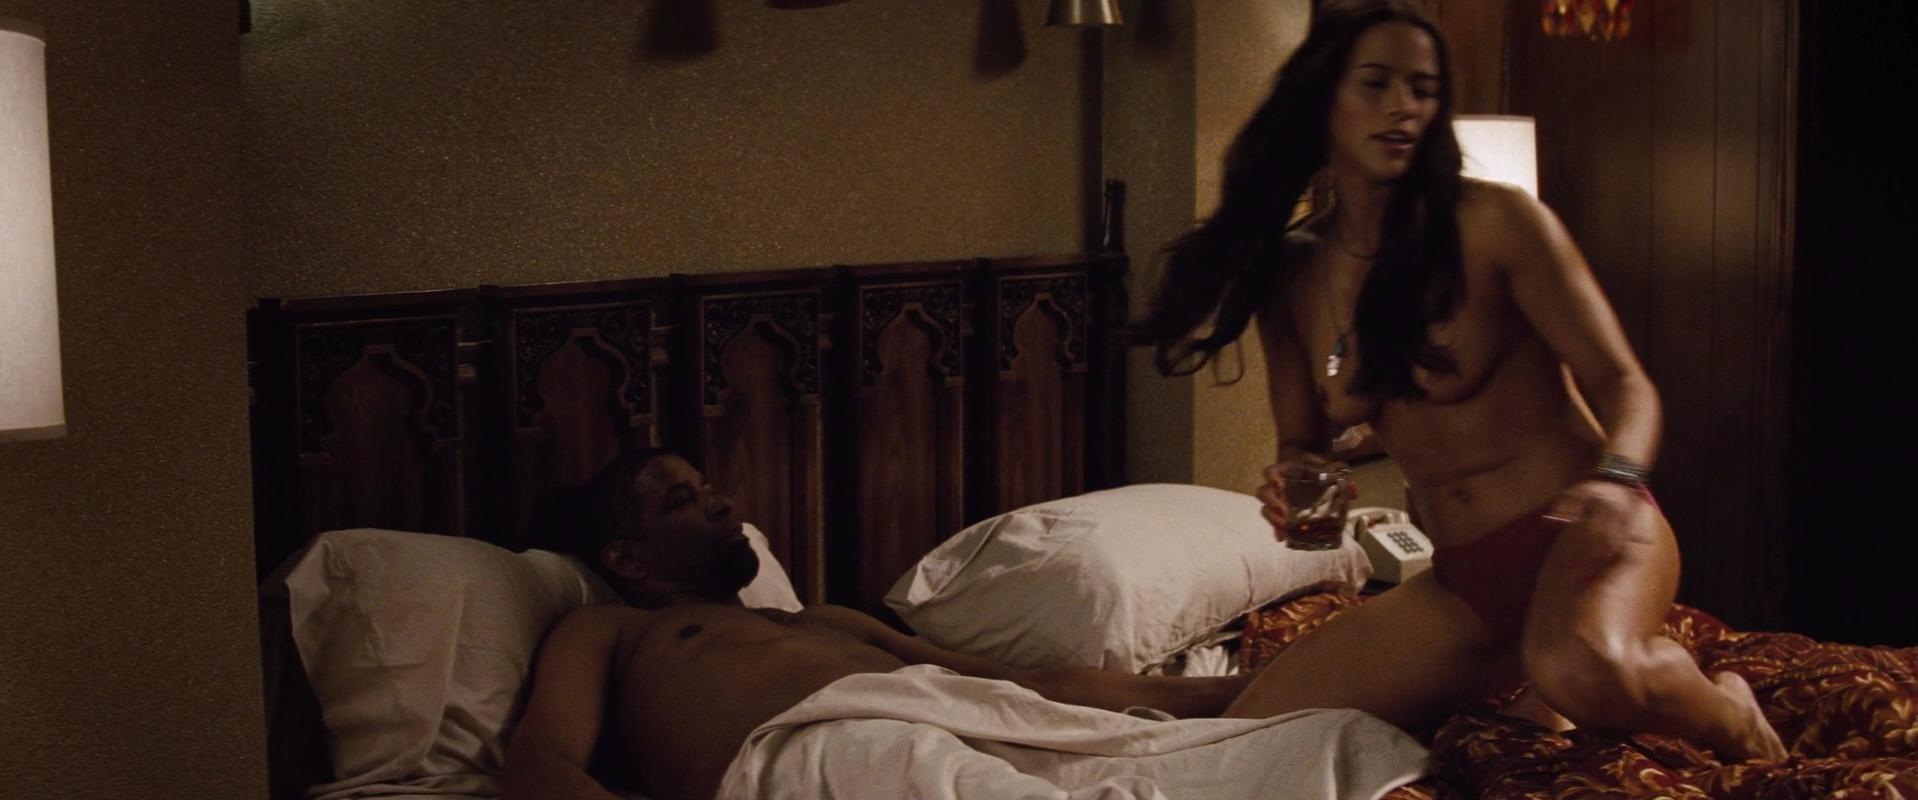 Paula Patton nude - 2 Guns (2013)